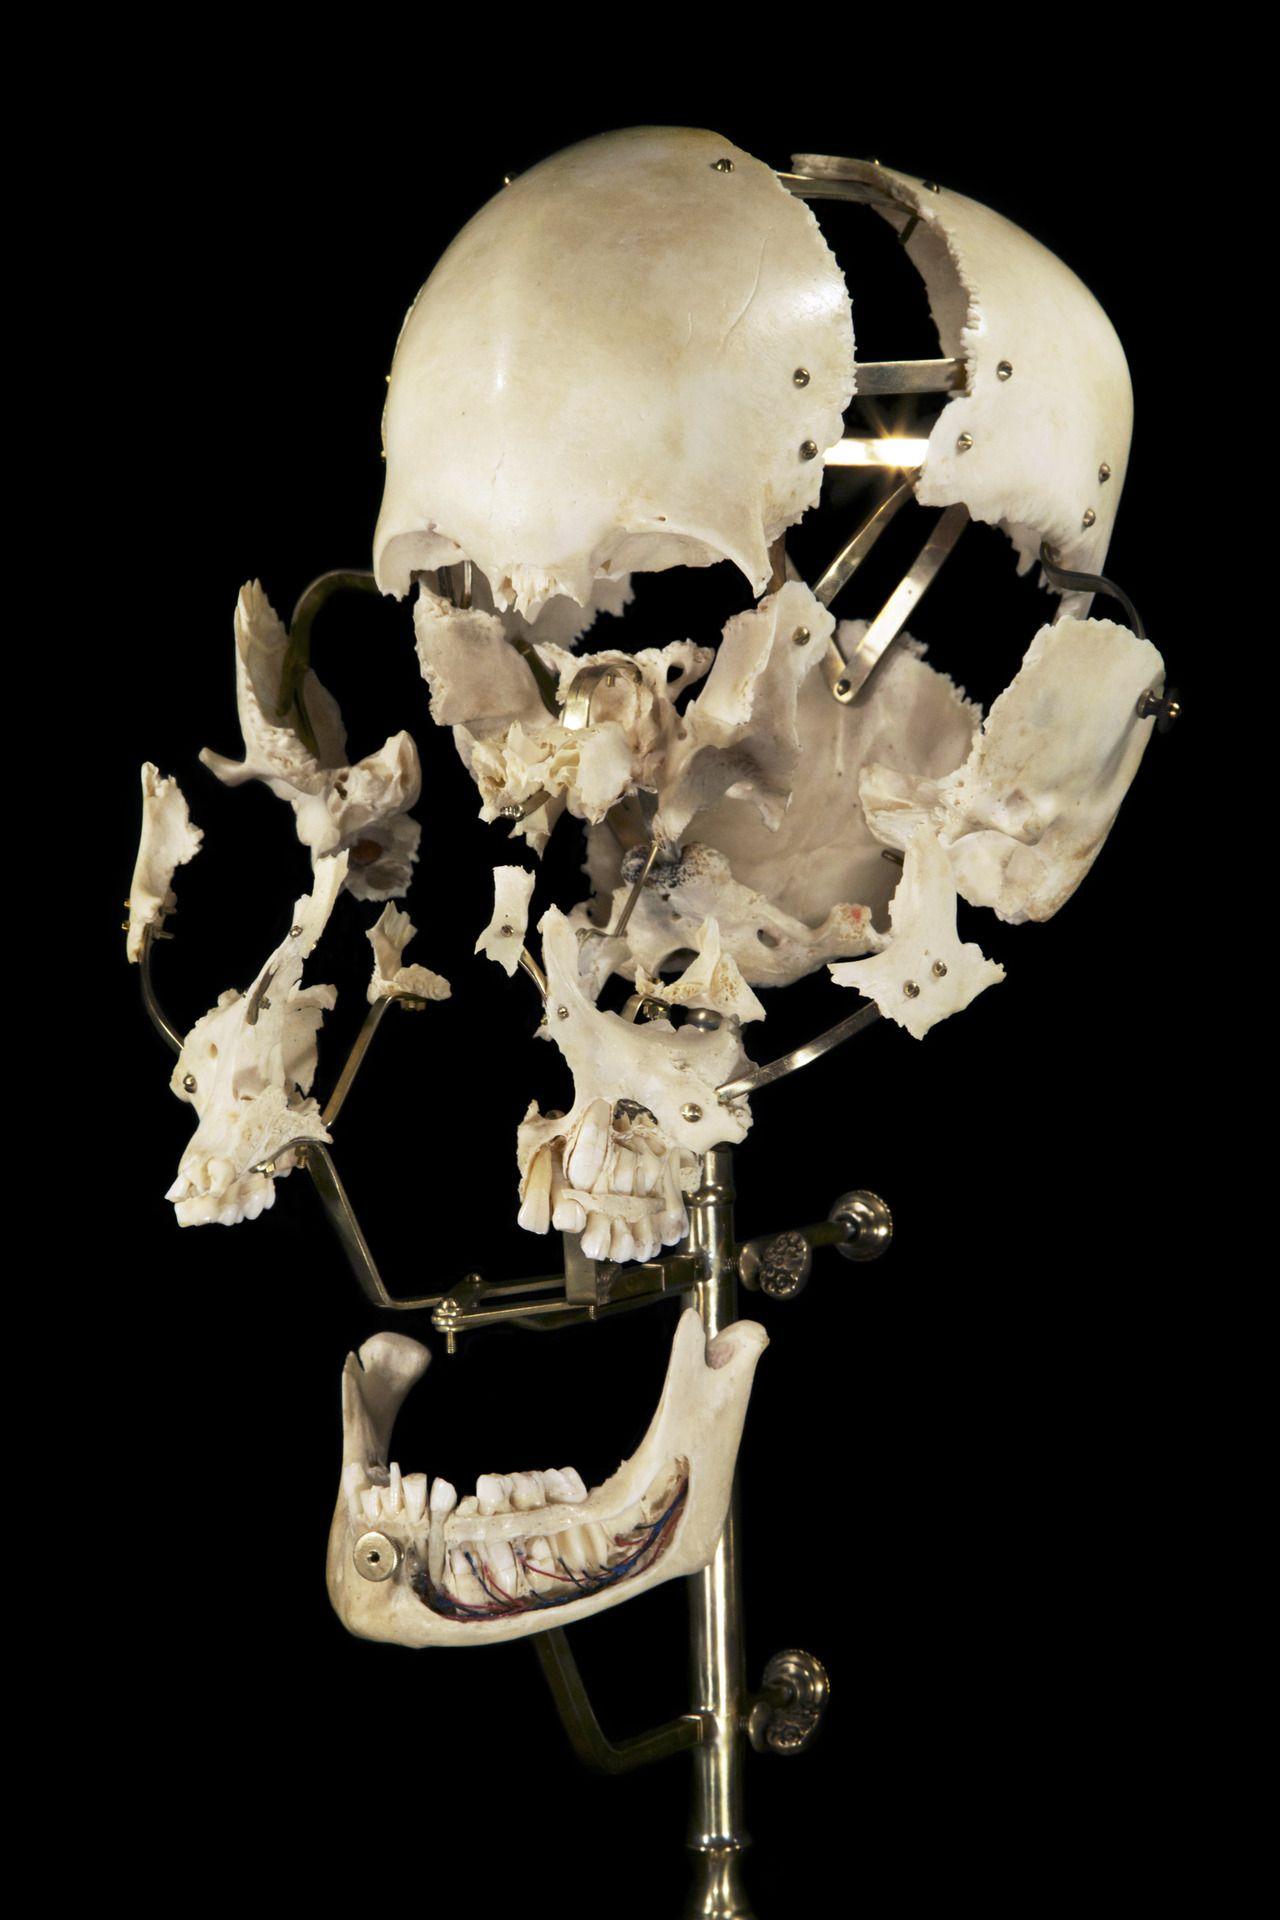 Exploded Human Skull by Ryan Matthew. Photo by Sergio Royzen ...